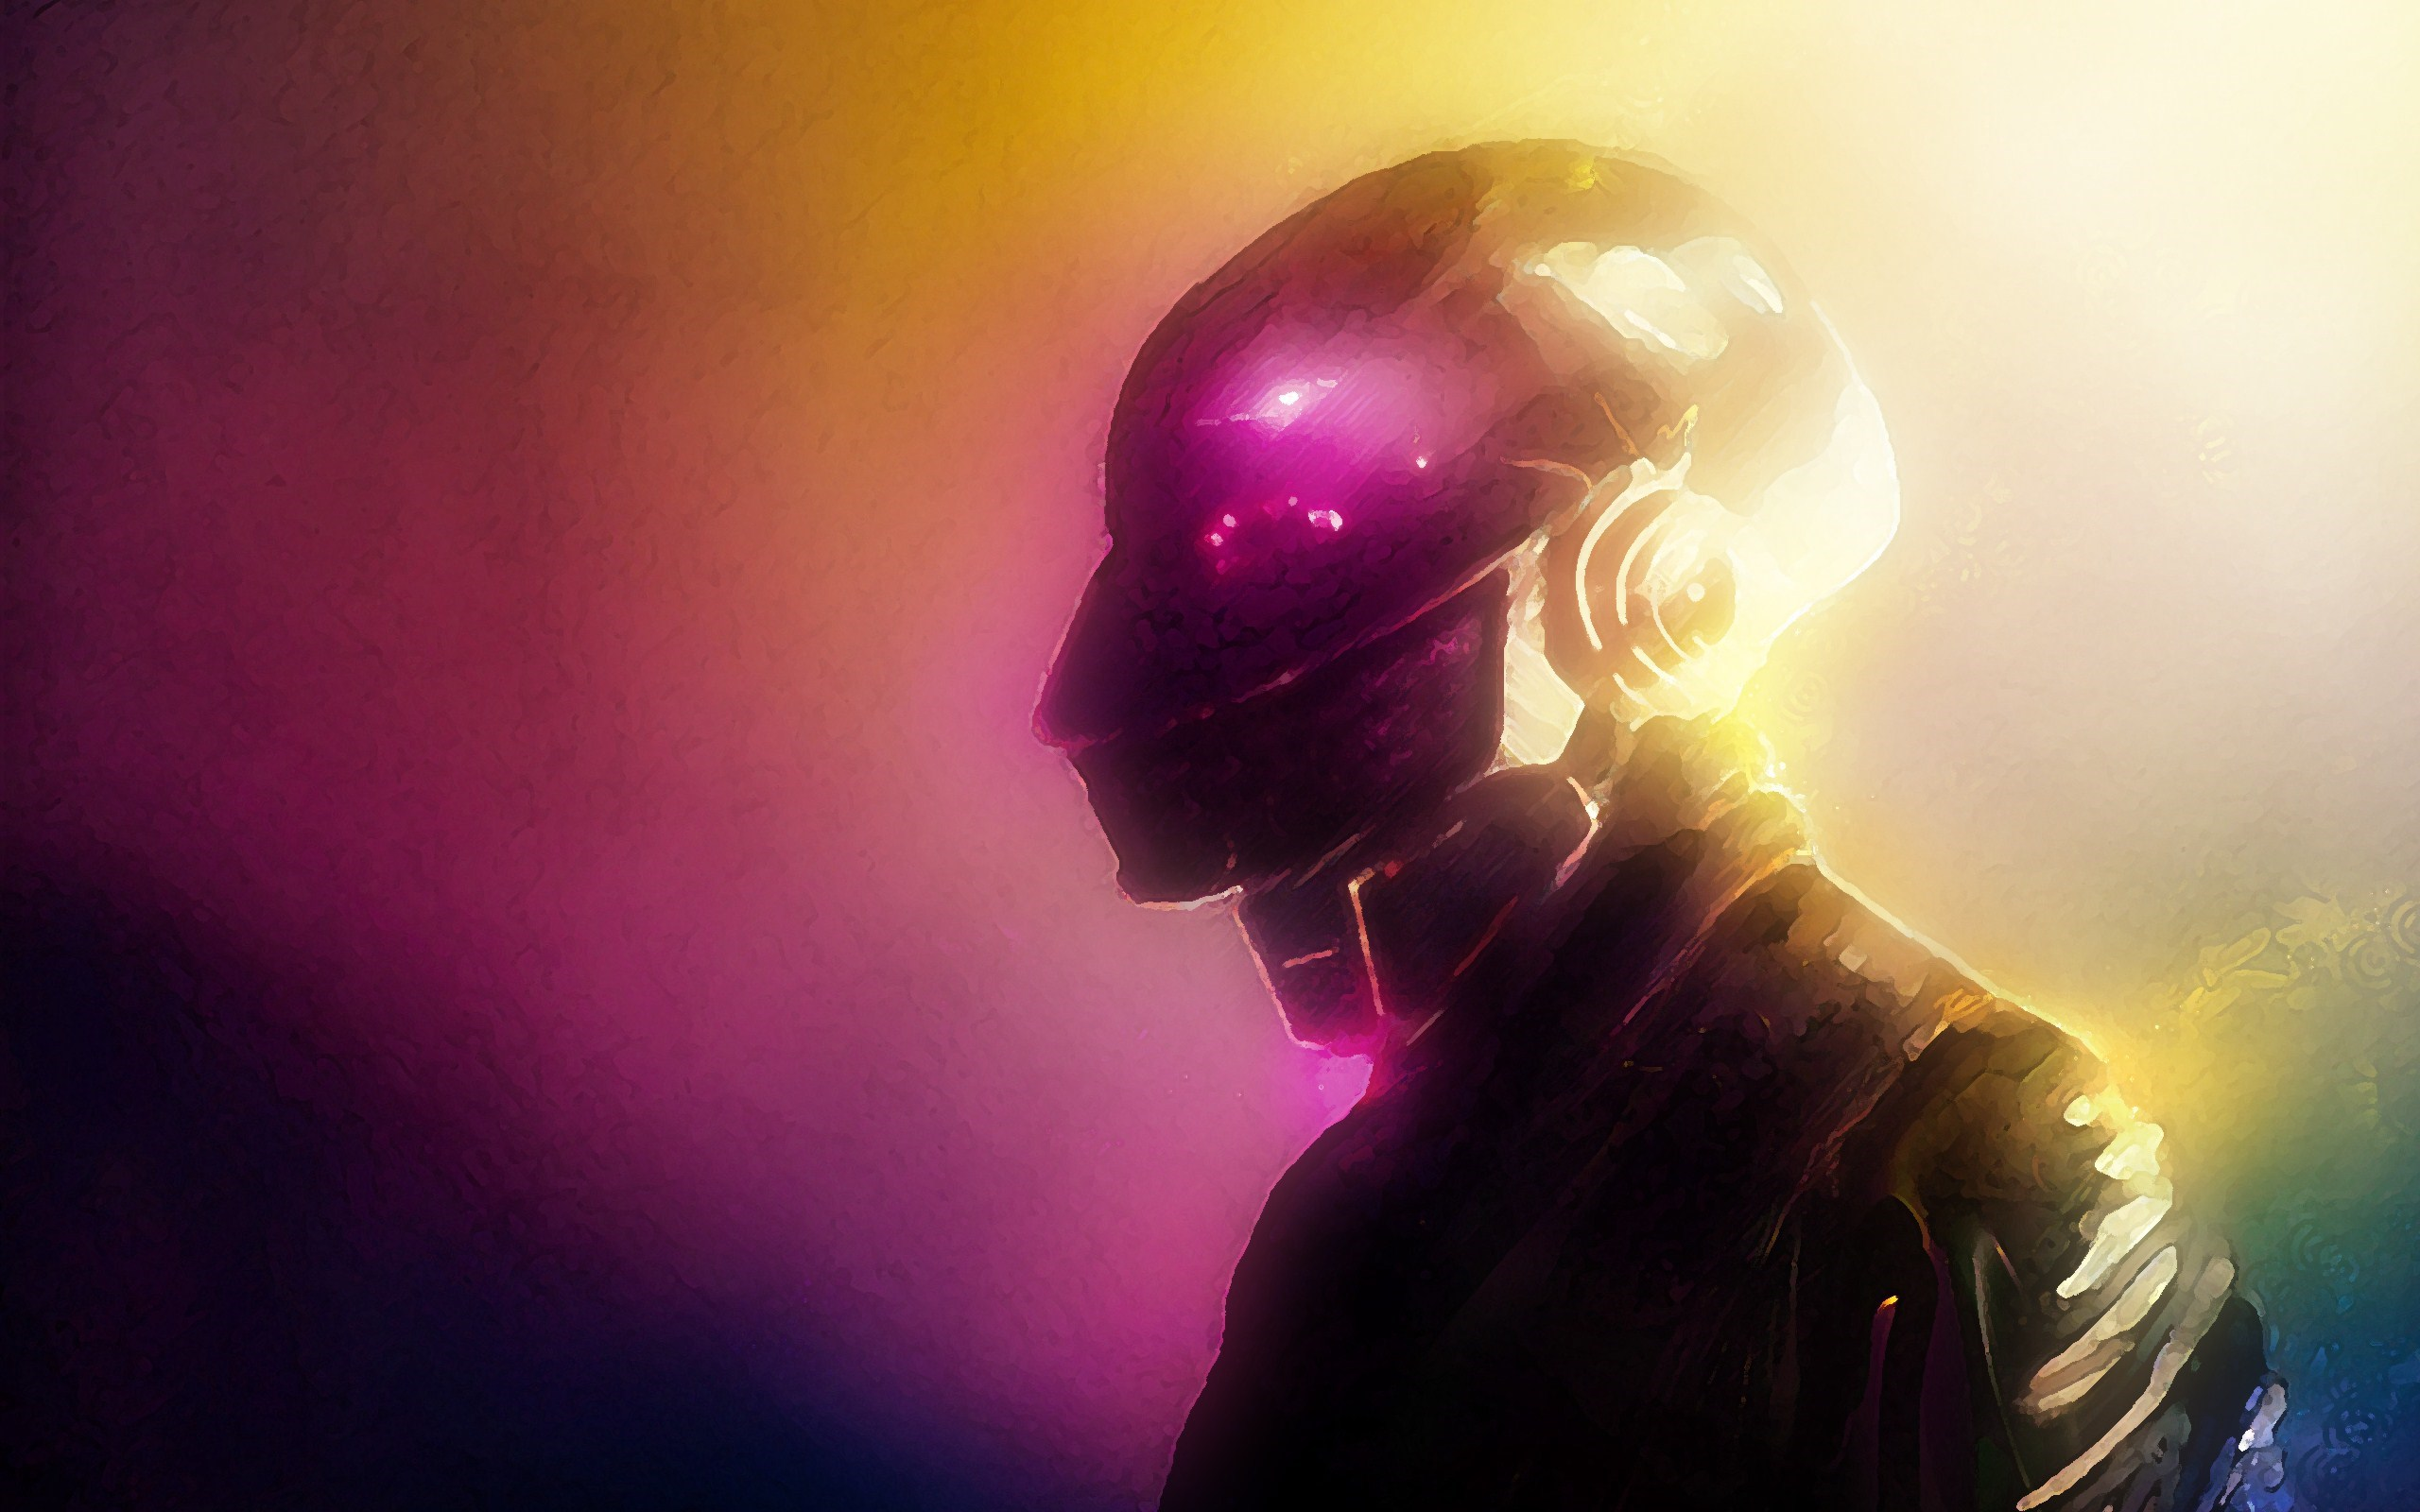 Daft Punk Music Artwork